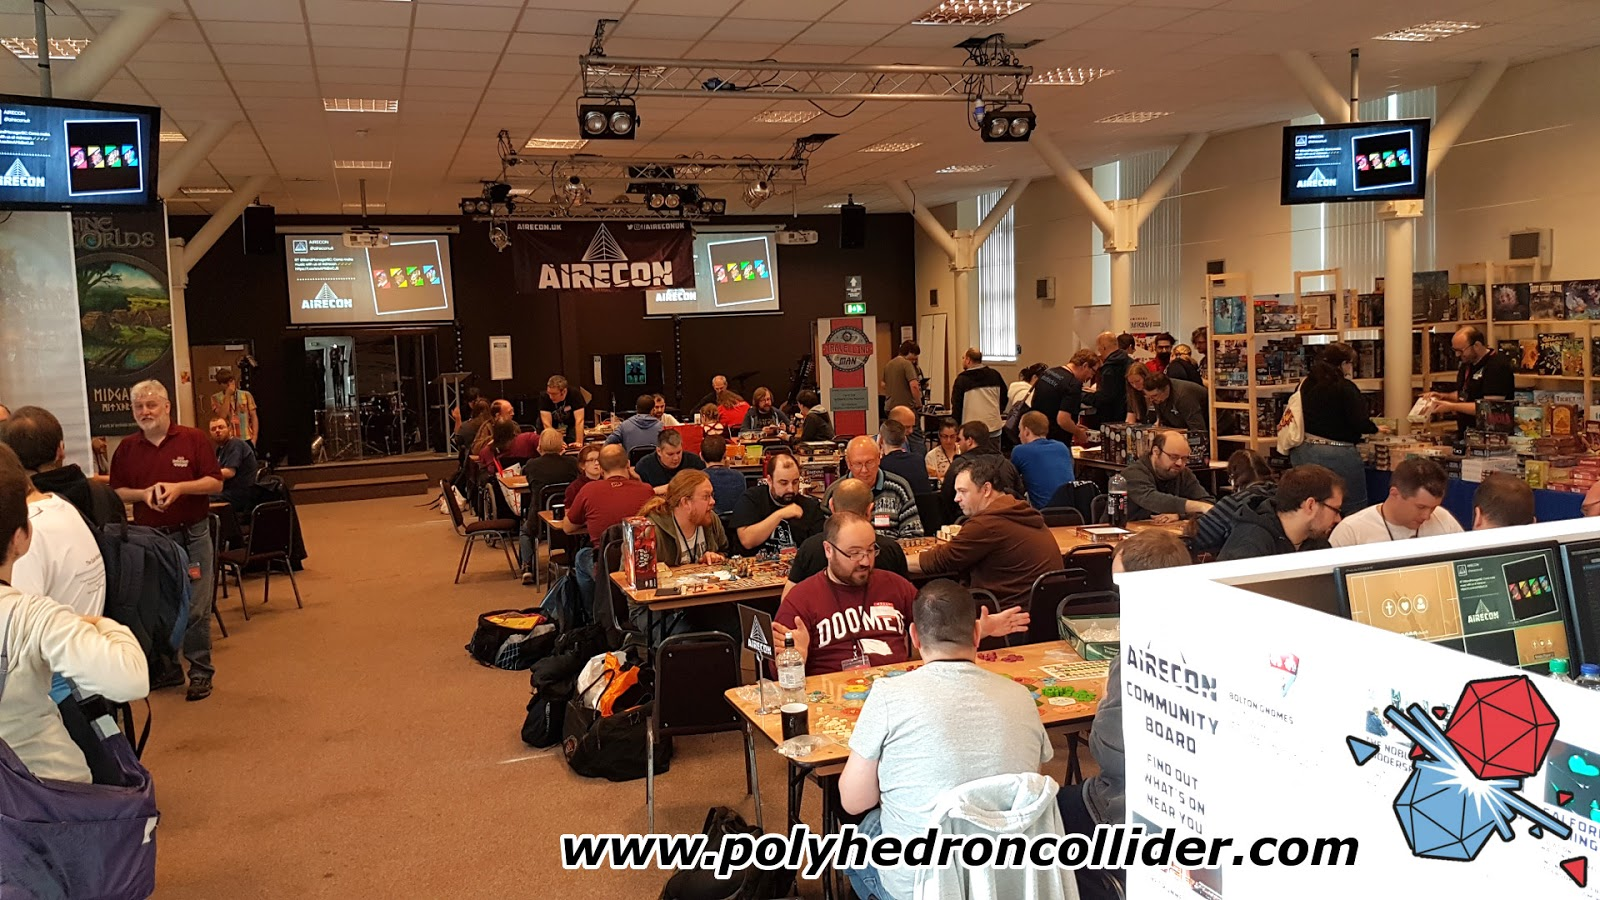 Airecon board game convention 2016